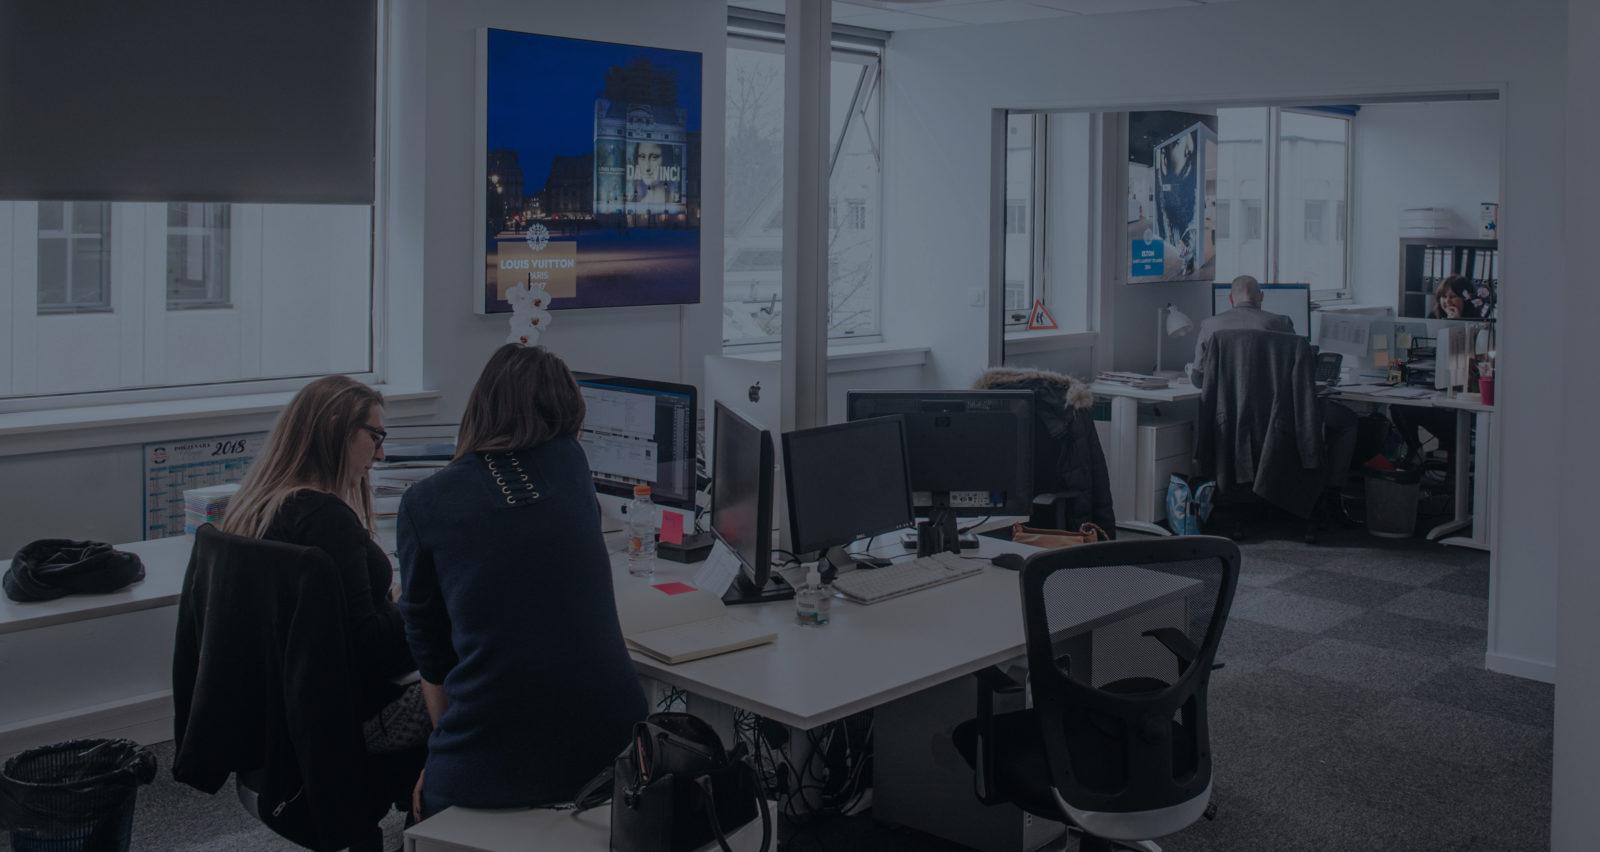 LightAir-collaborateurs-bureau-travail